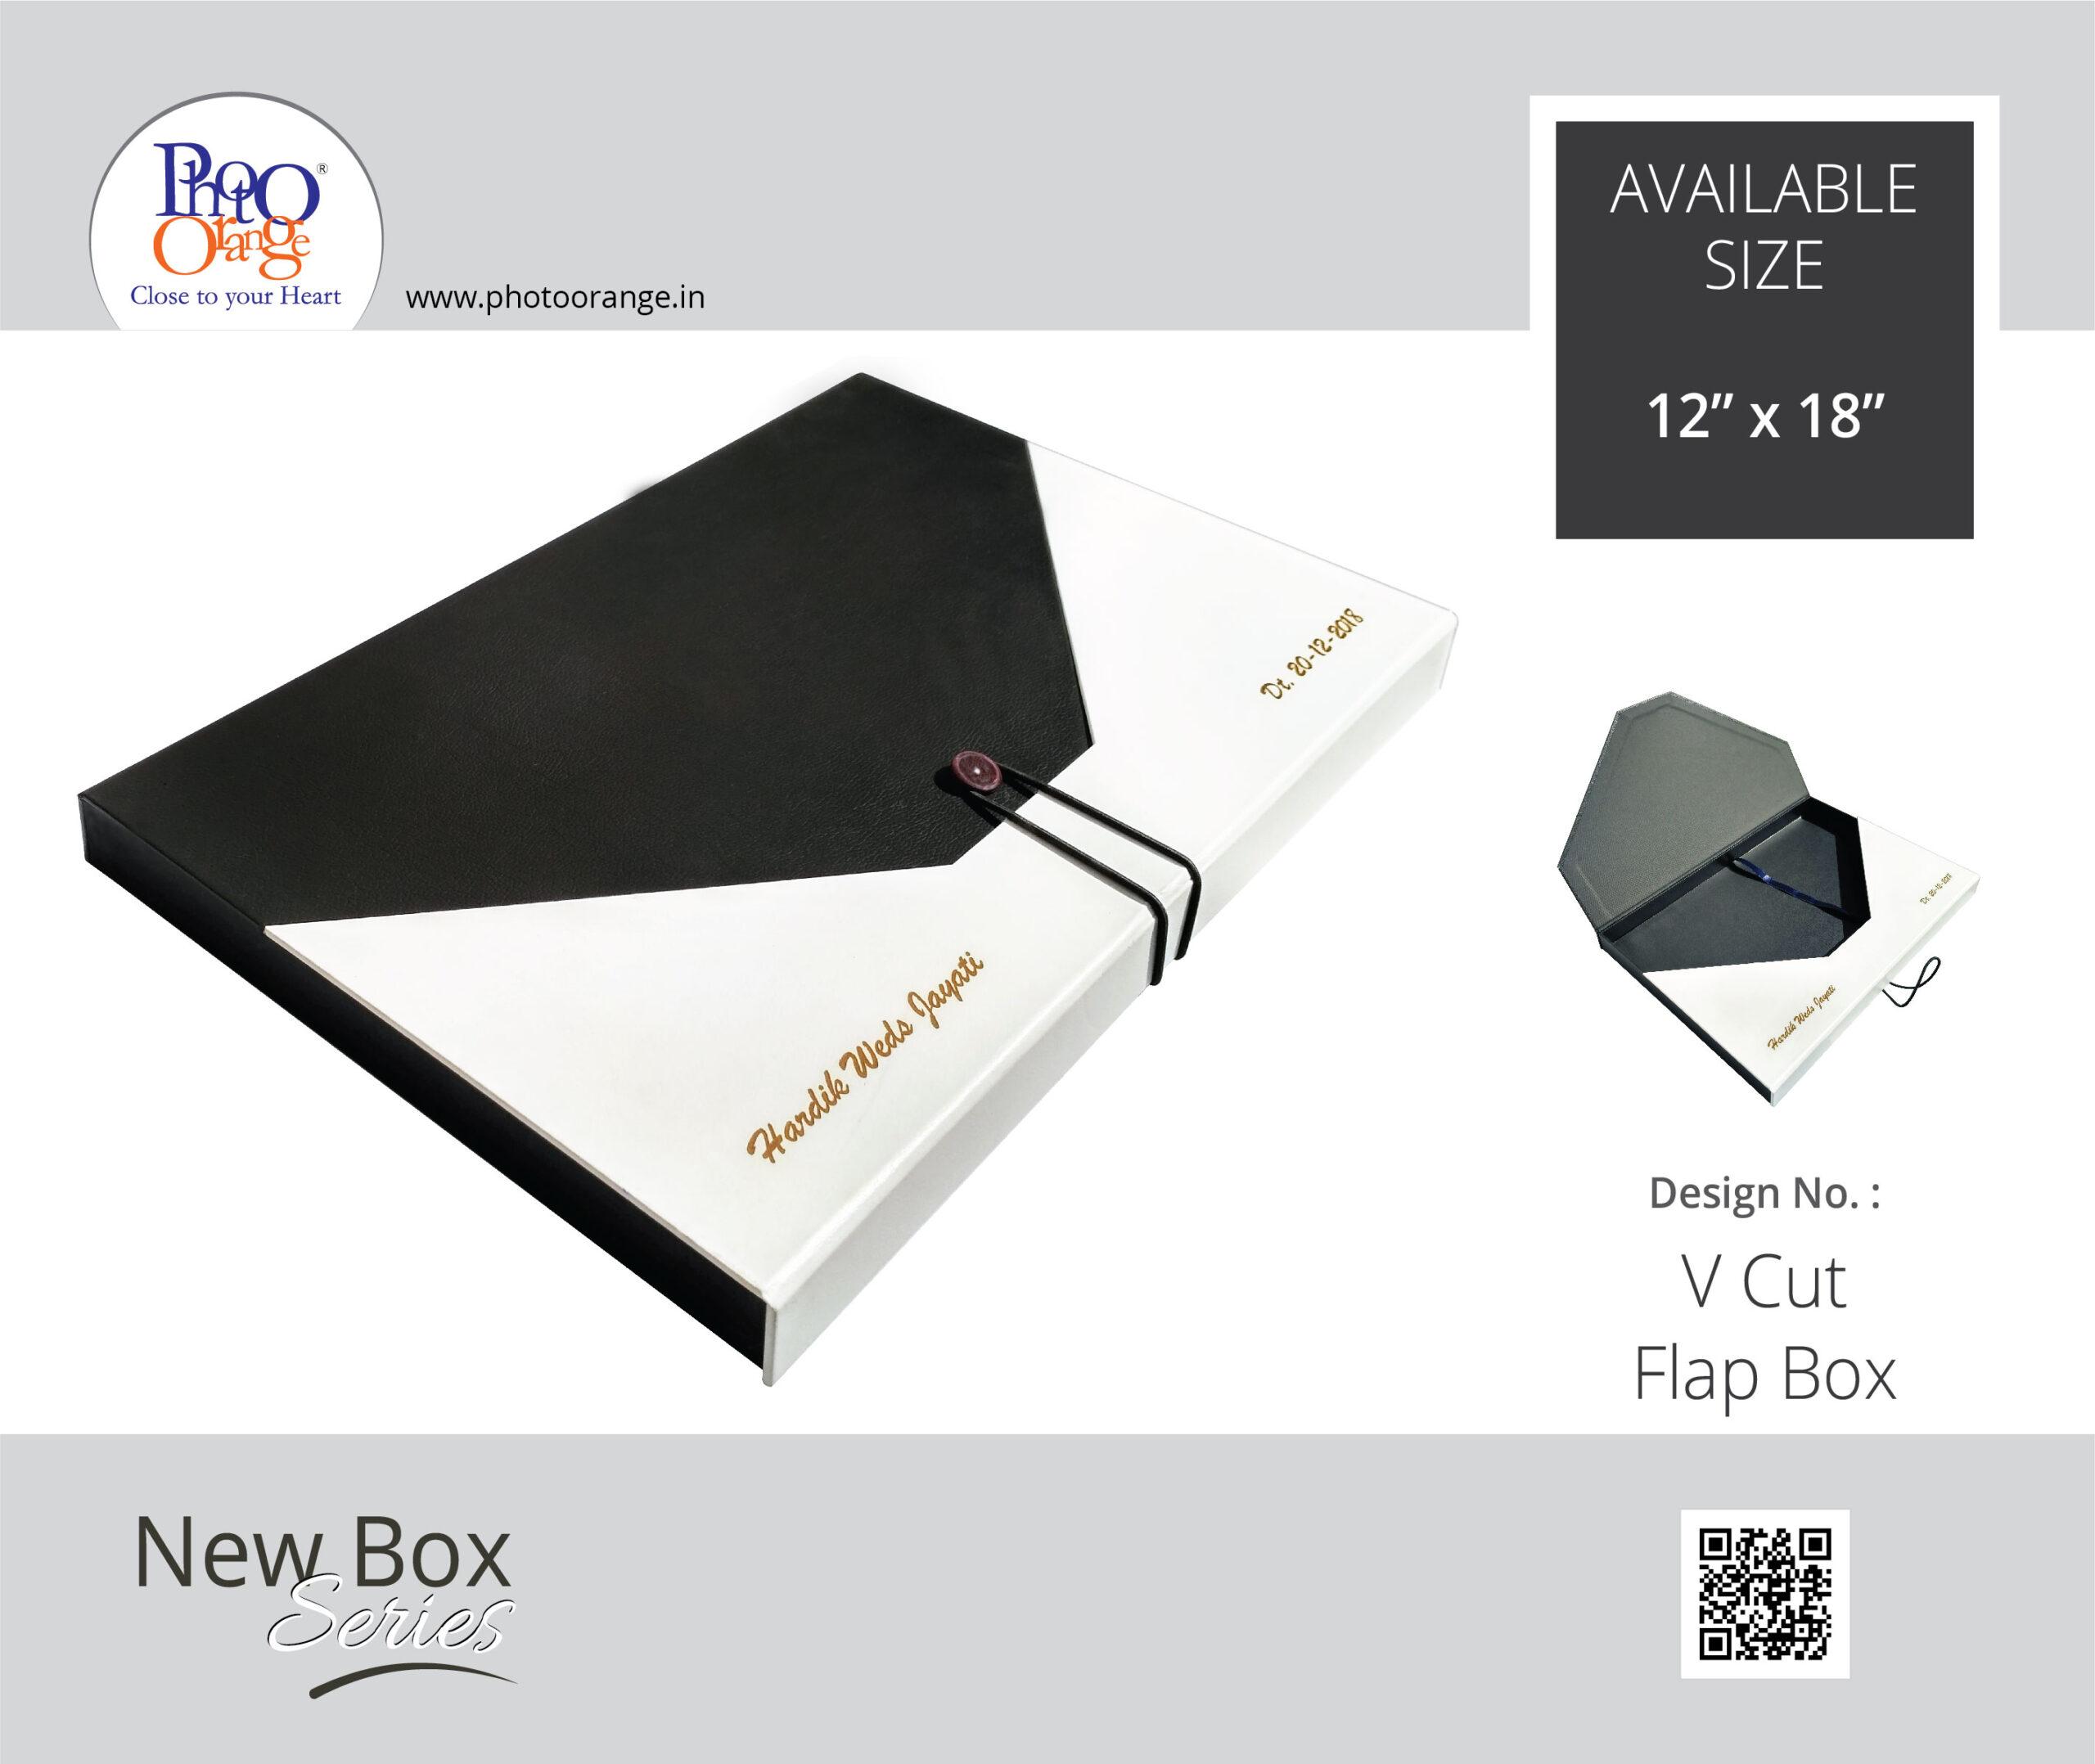 V Cut Flap Box